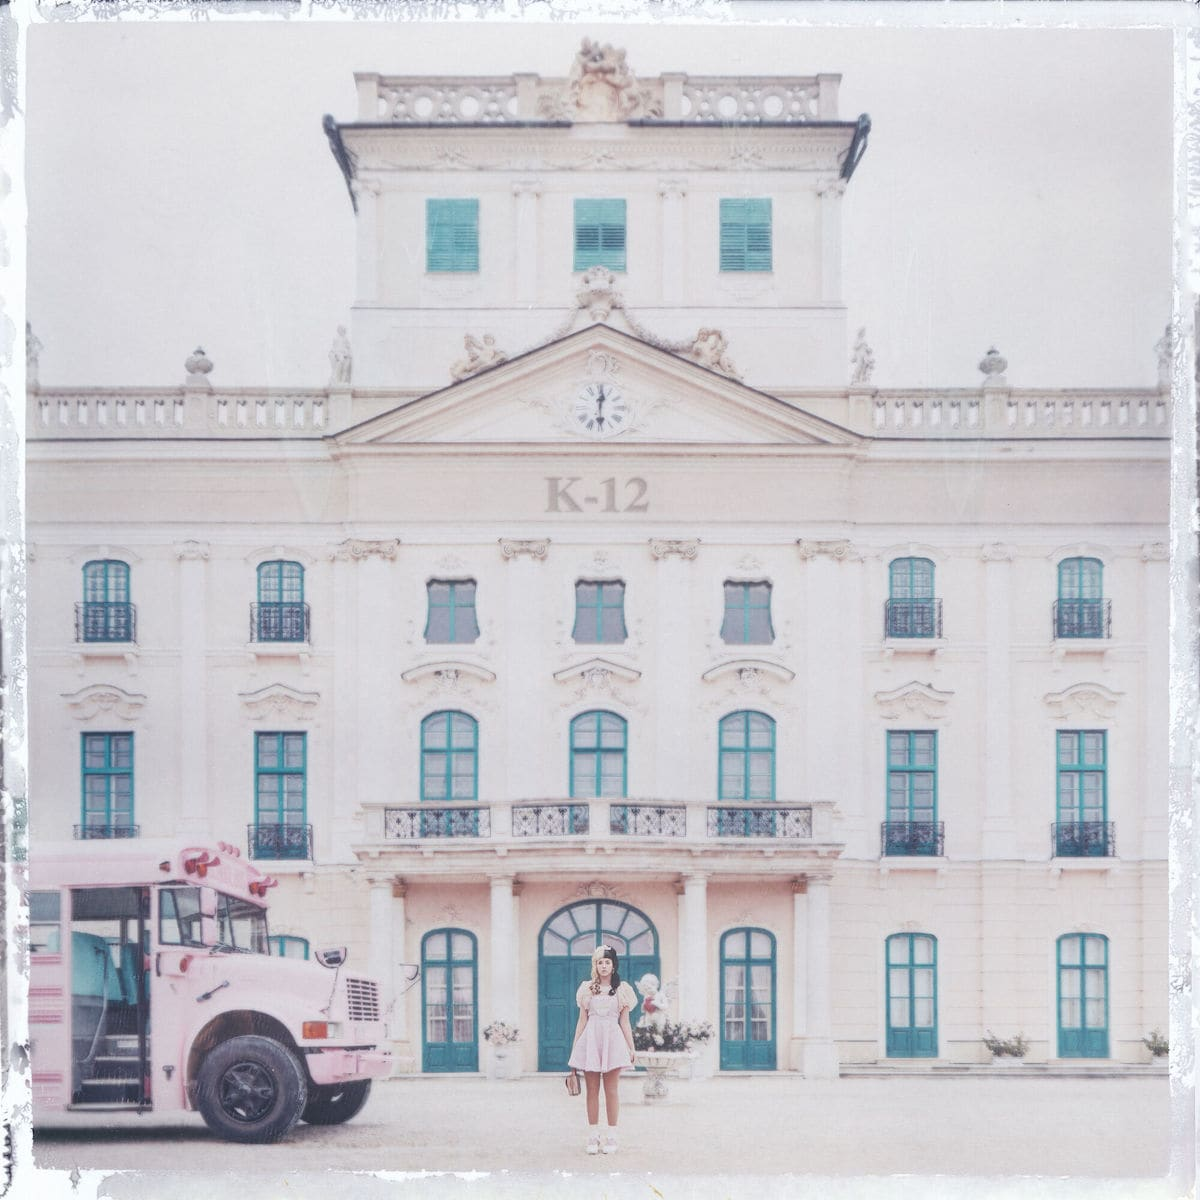 Album Melanie Martinez